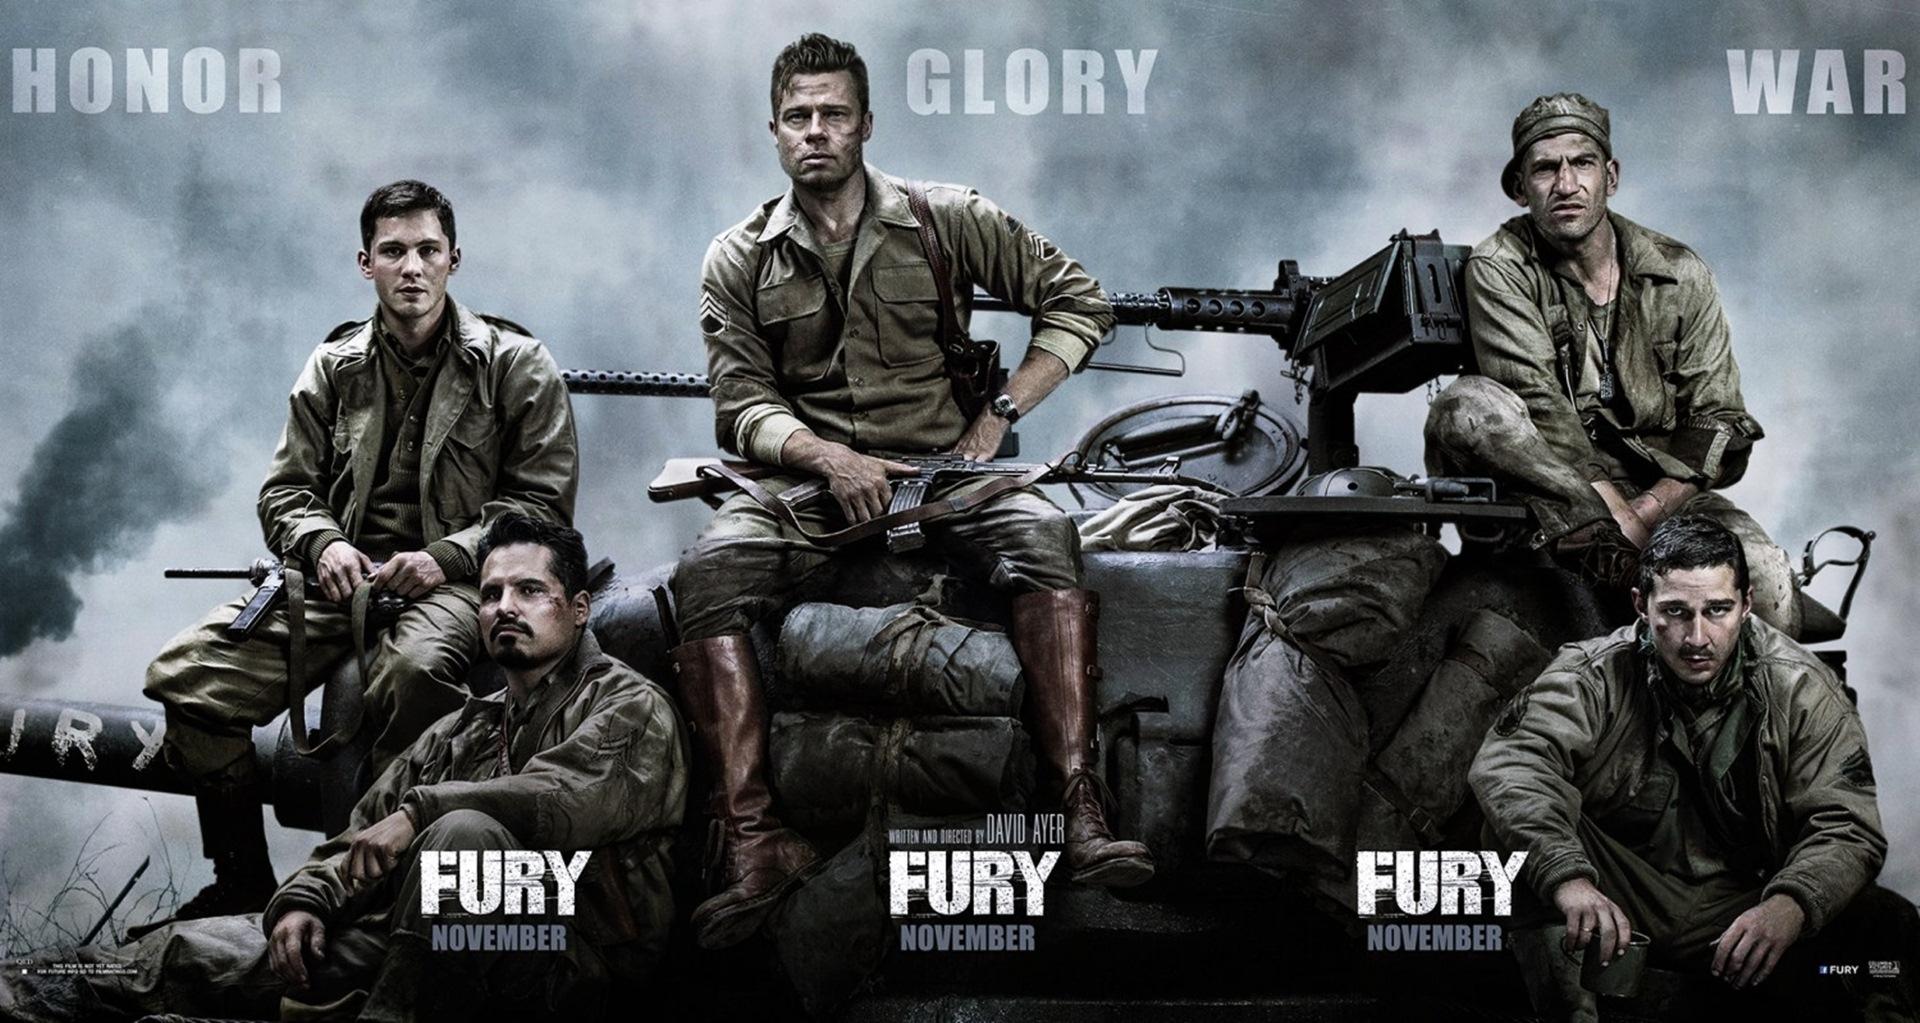 Fury Movie Movie HD Wallpapers 1920x1023